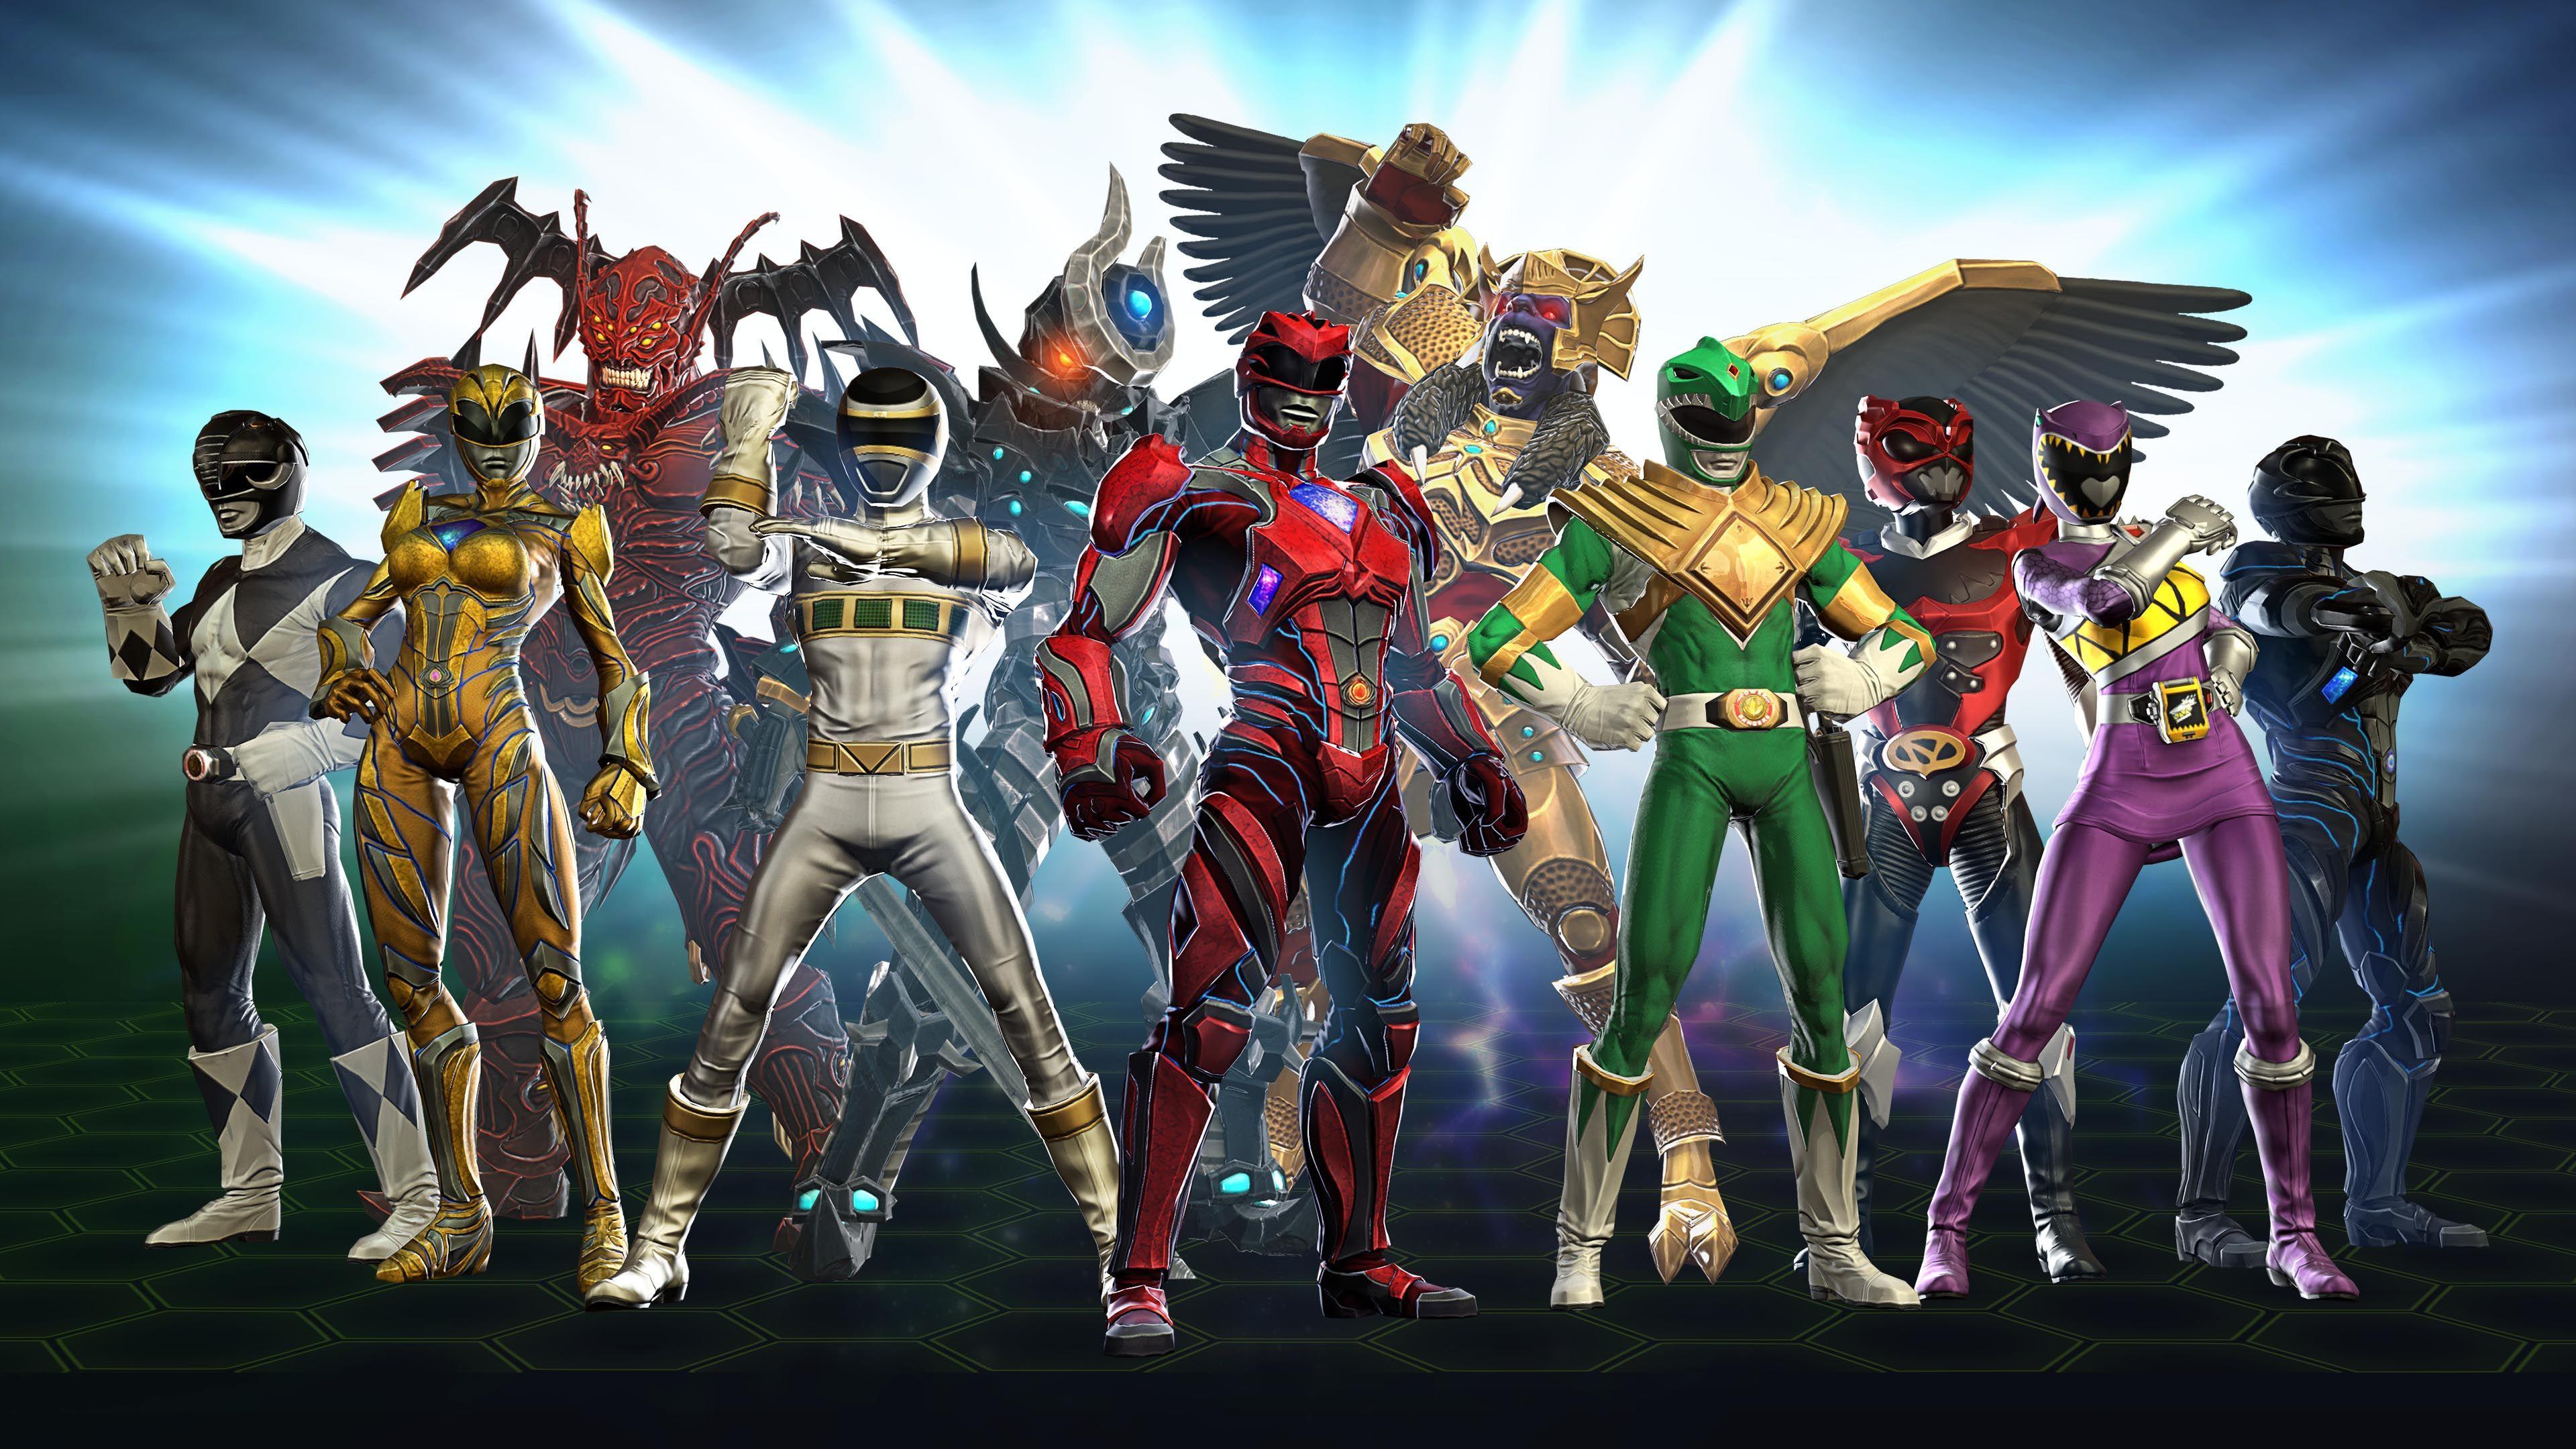 Power Rangers Heroes Wallpapers - Wallpaper Cave